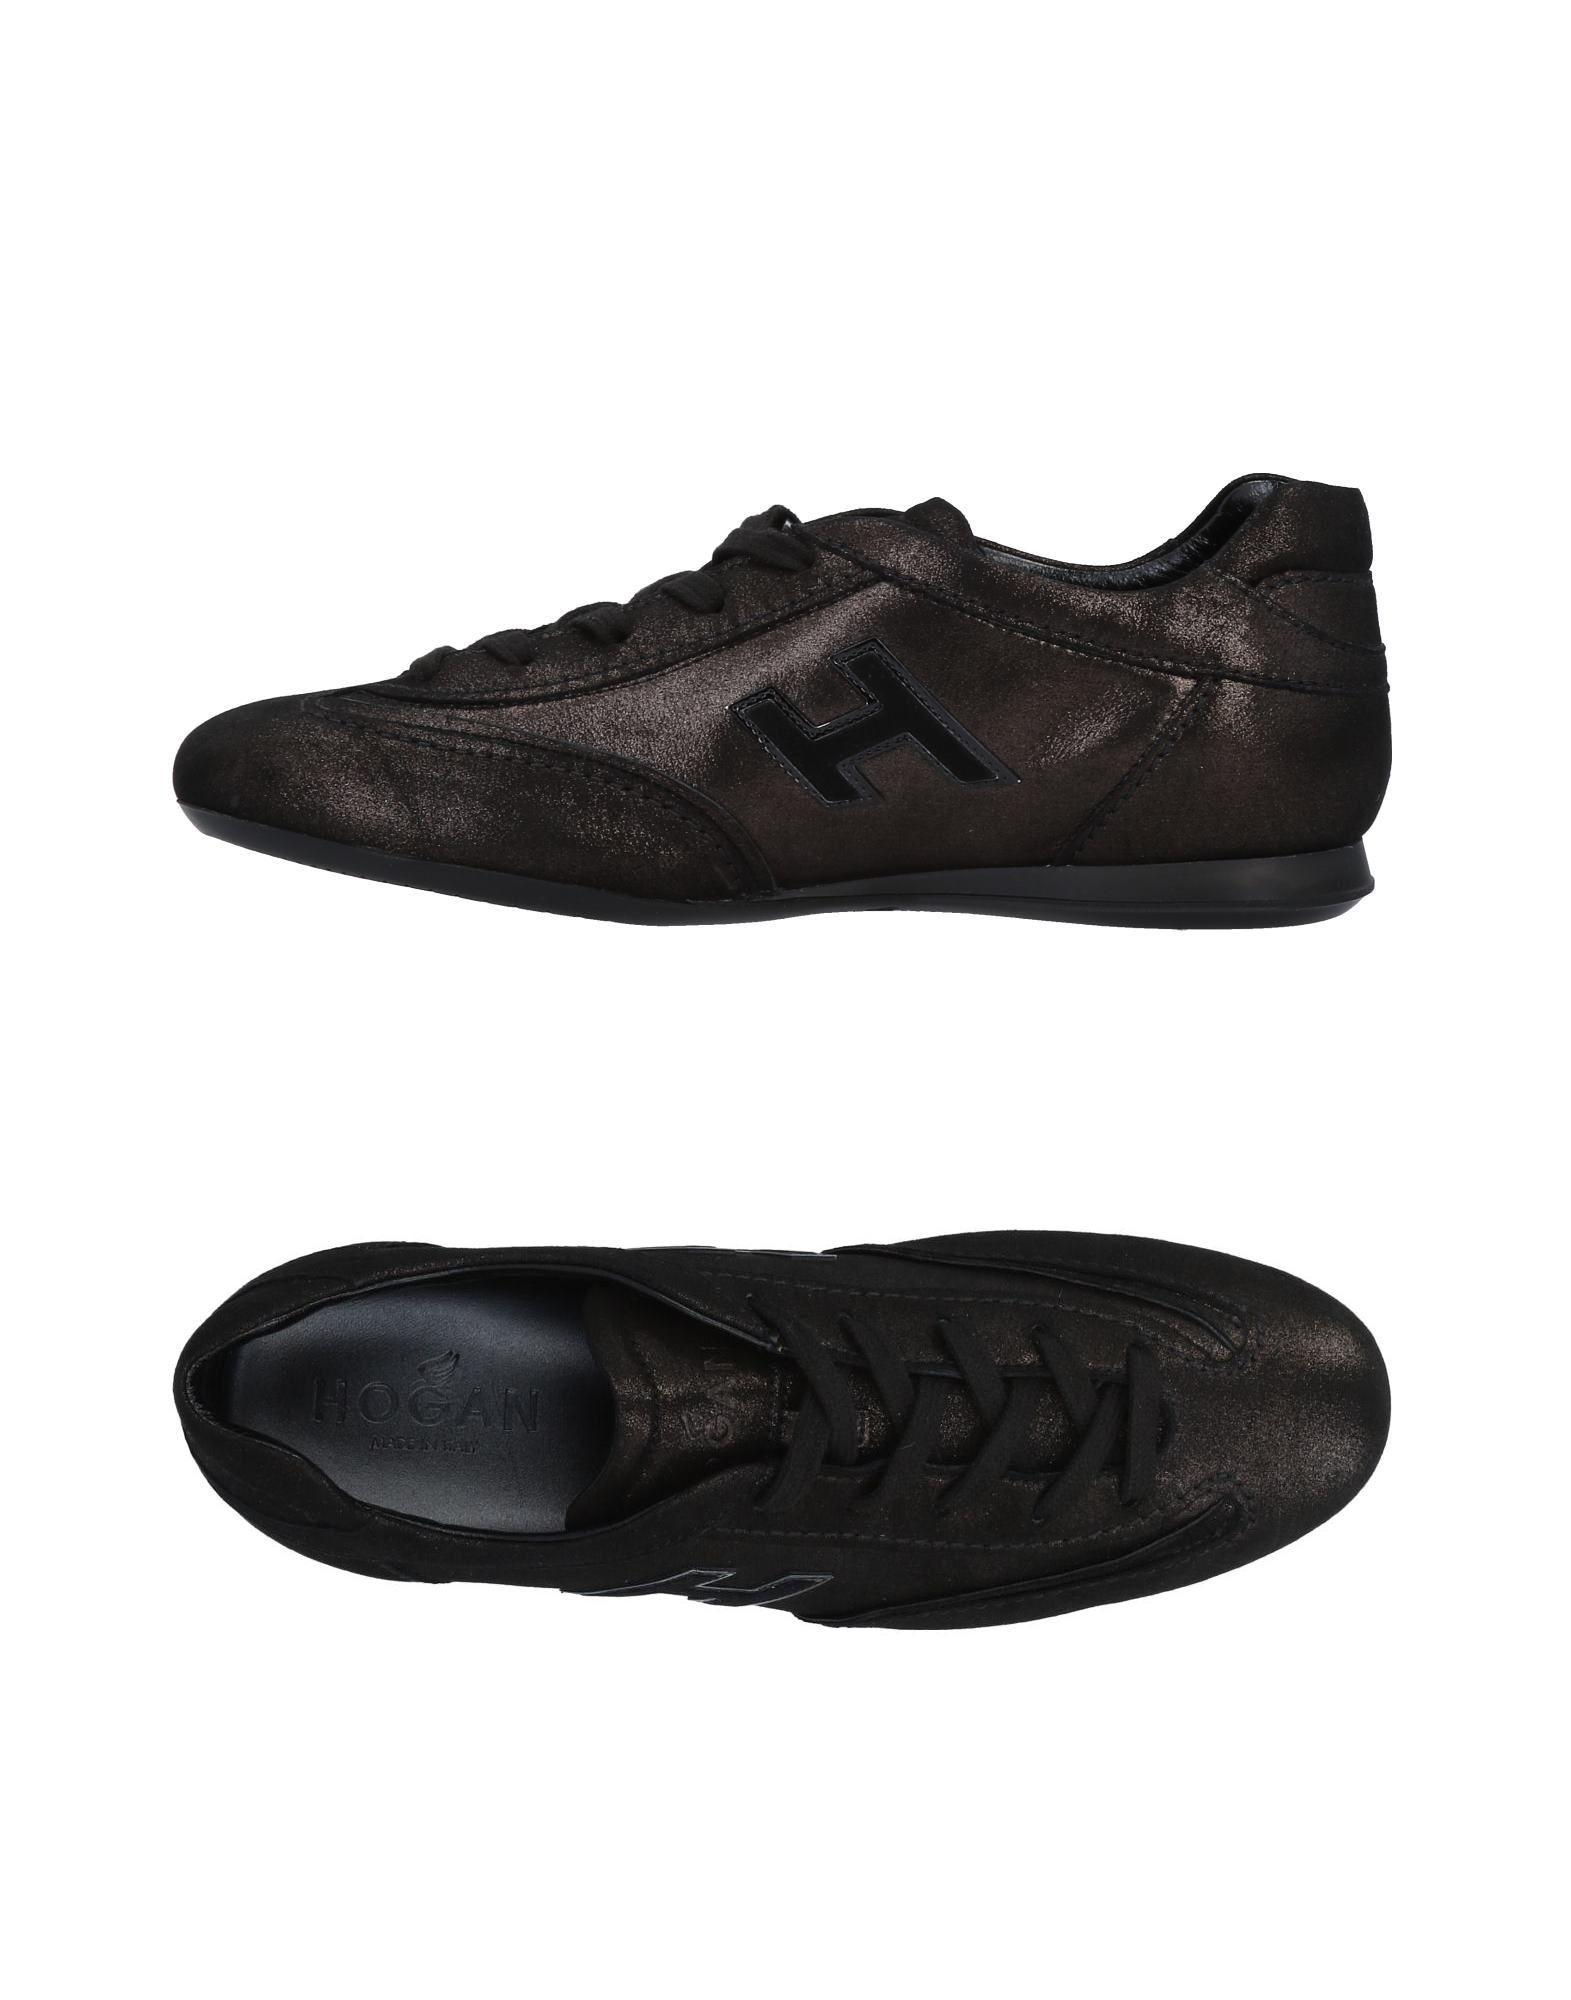 A buon mercato Sneakers Hogan Donna - 11494378NN